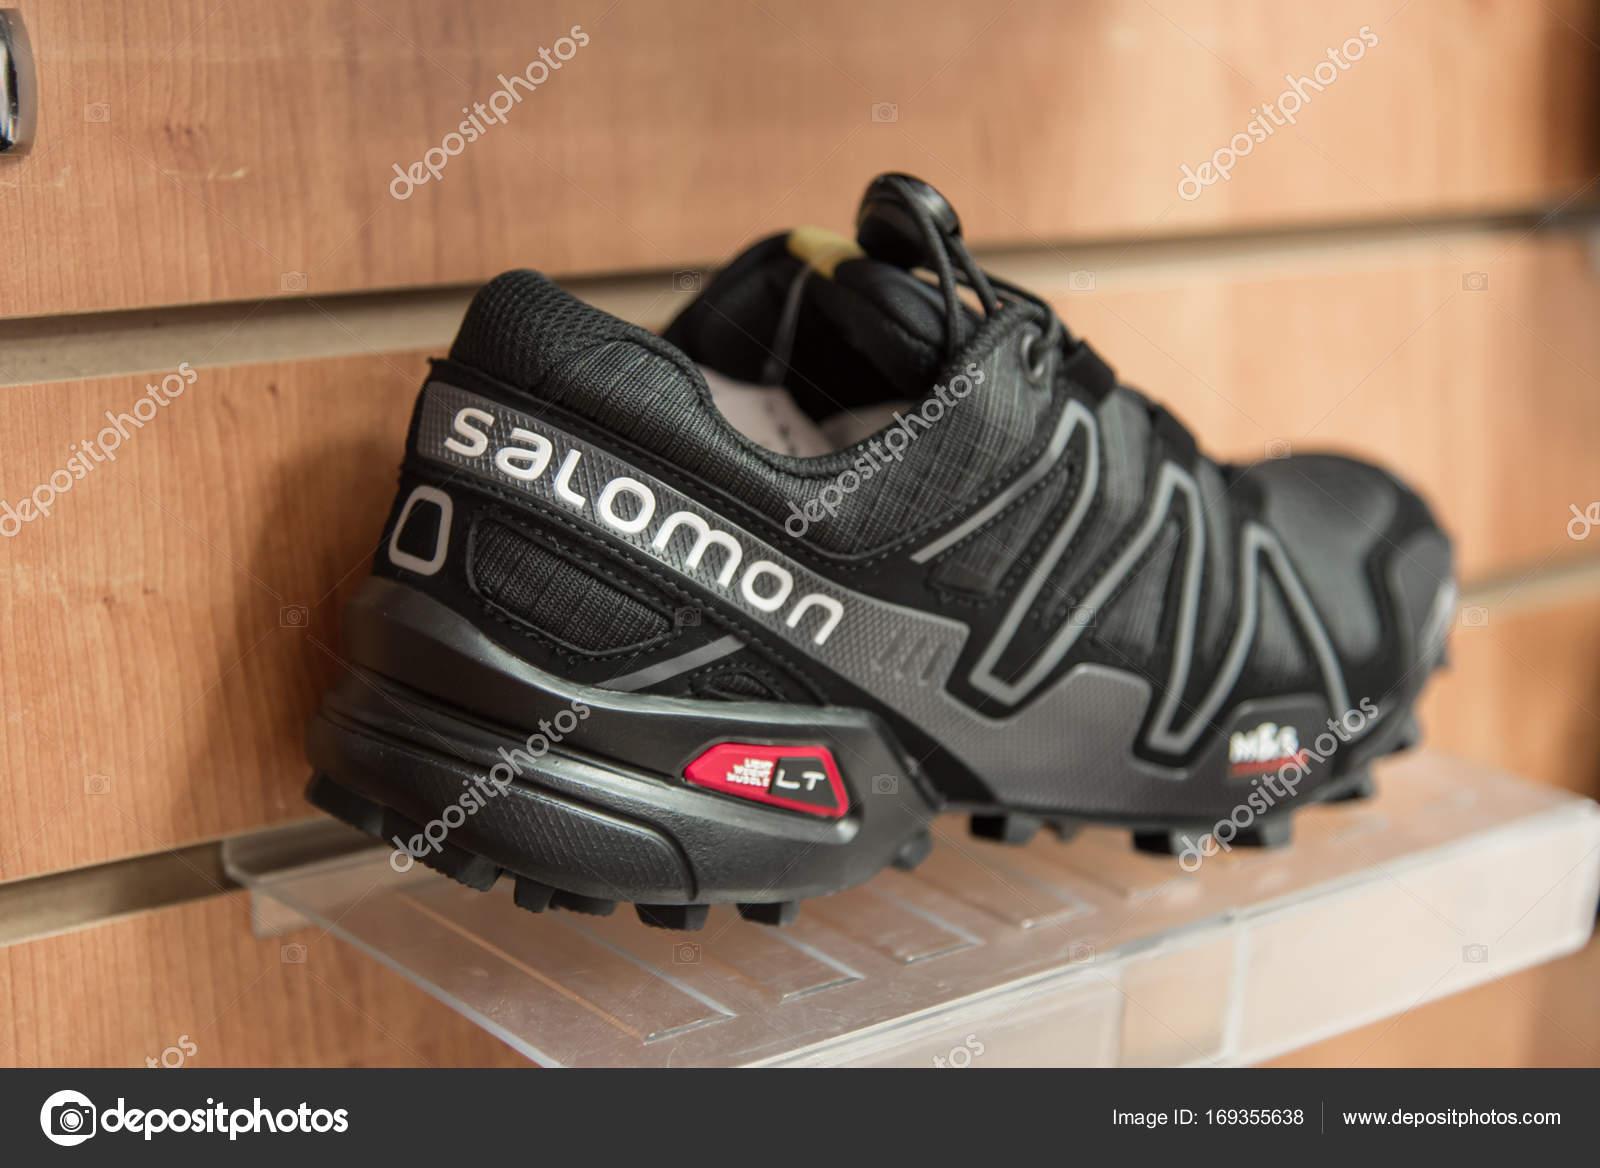 35a22e713db7 Новокузнецк, Россия - 30 августа 2017  Макро Саломон логотип на обуви —  Фото автора Konstantinp